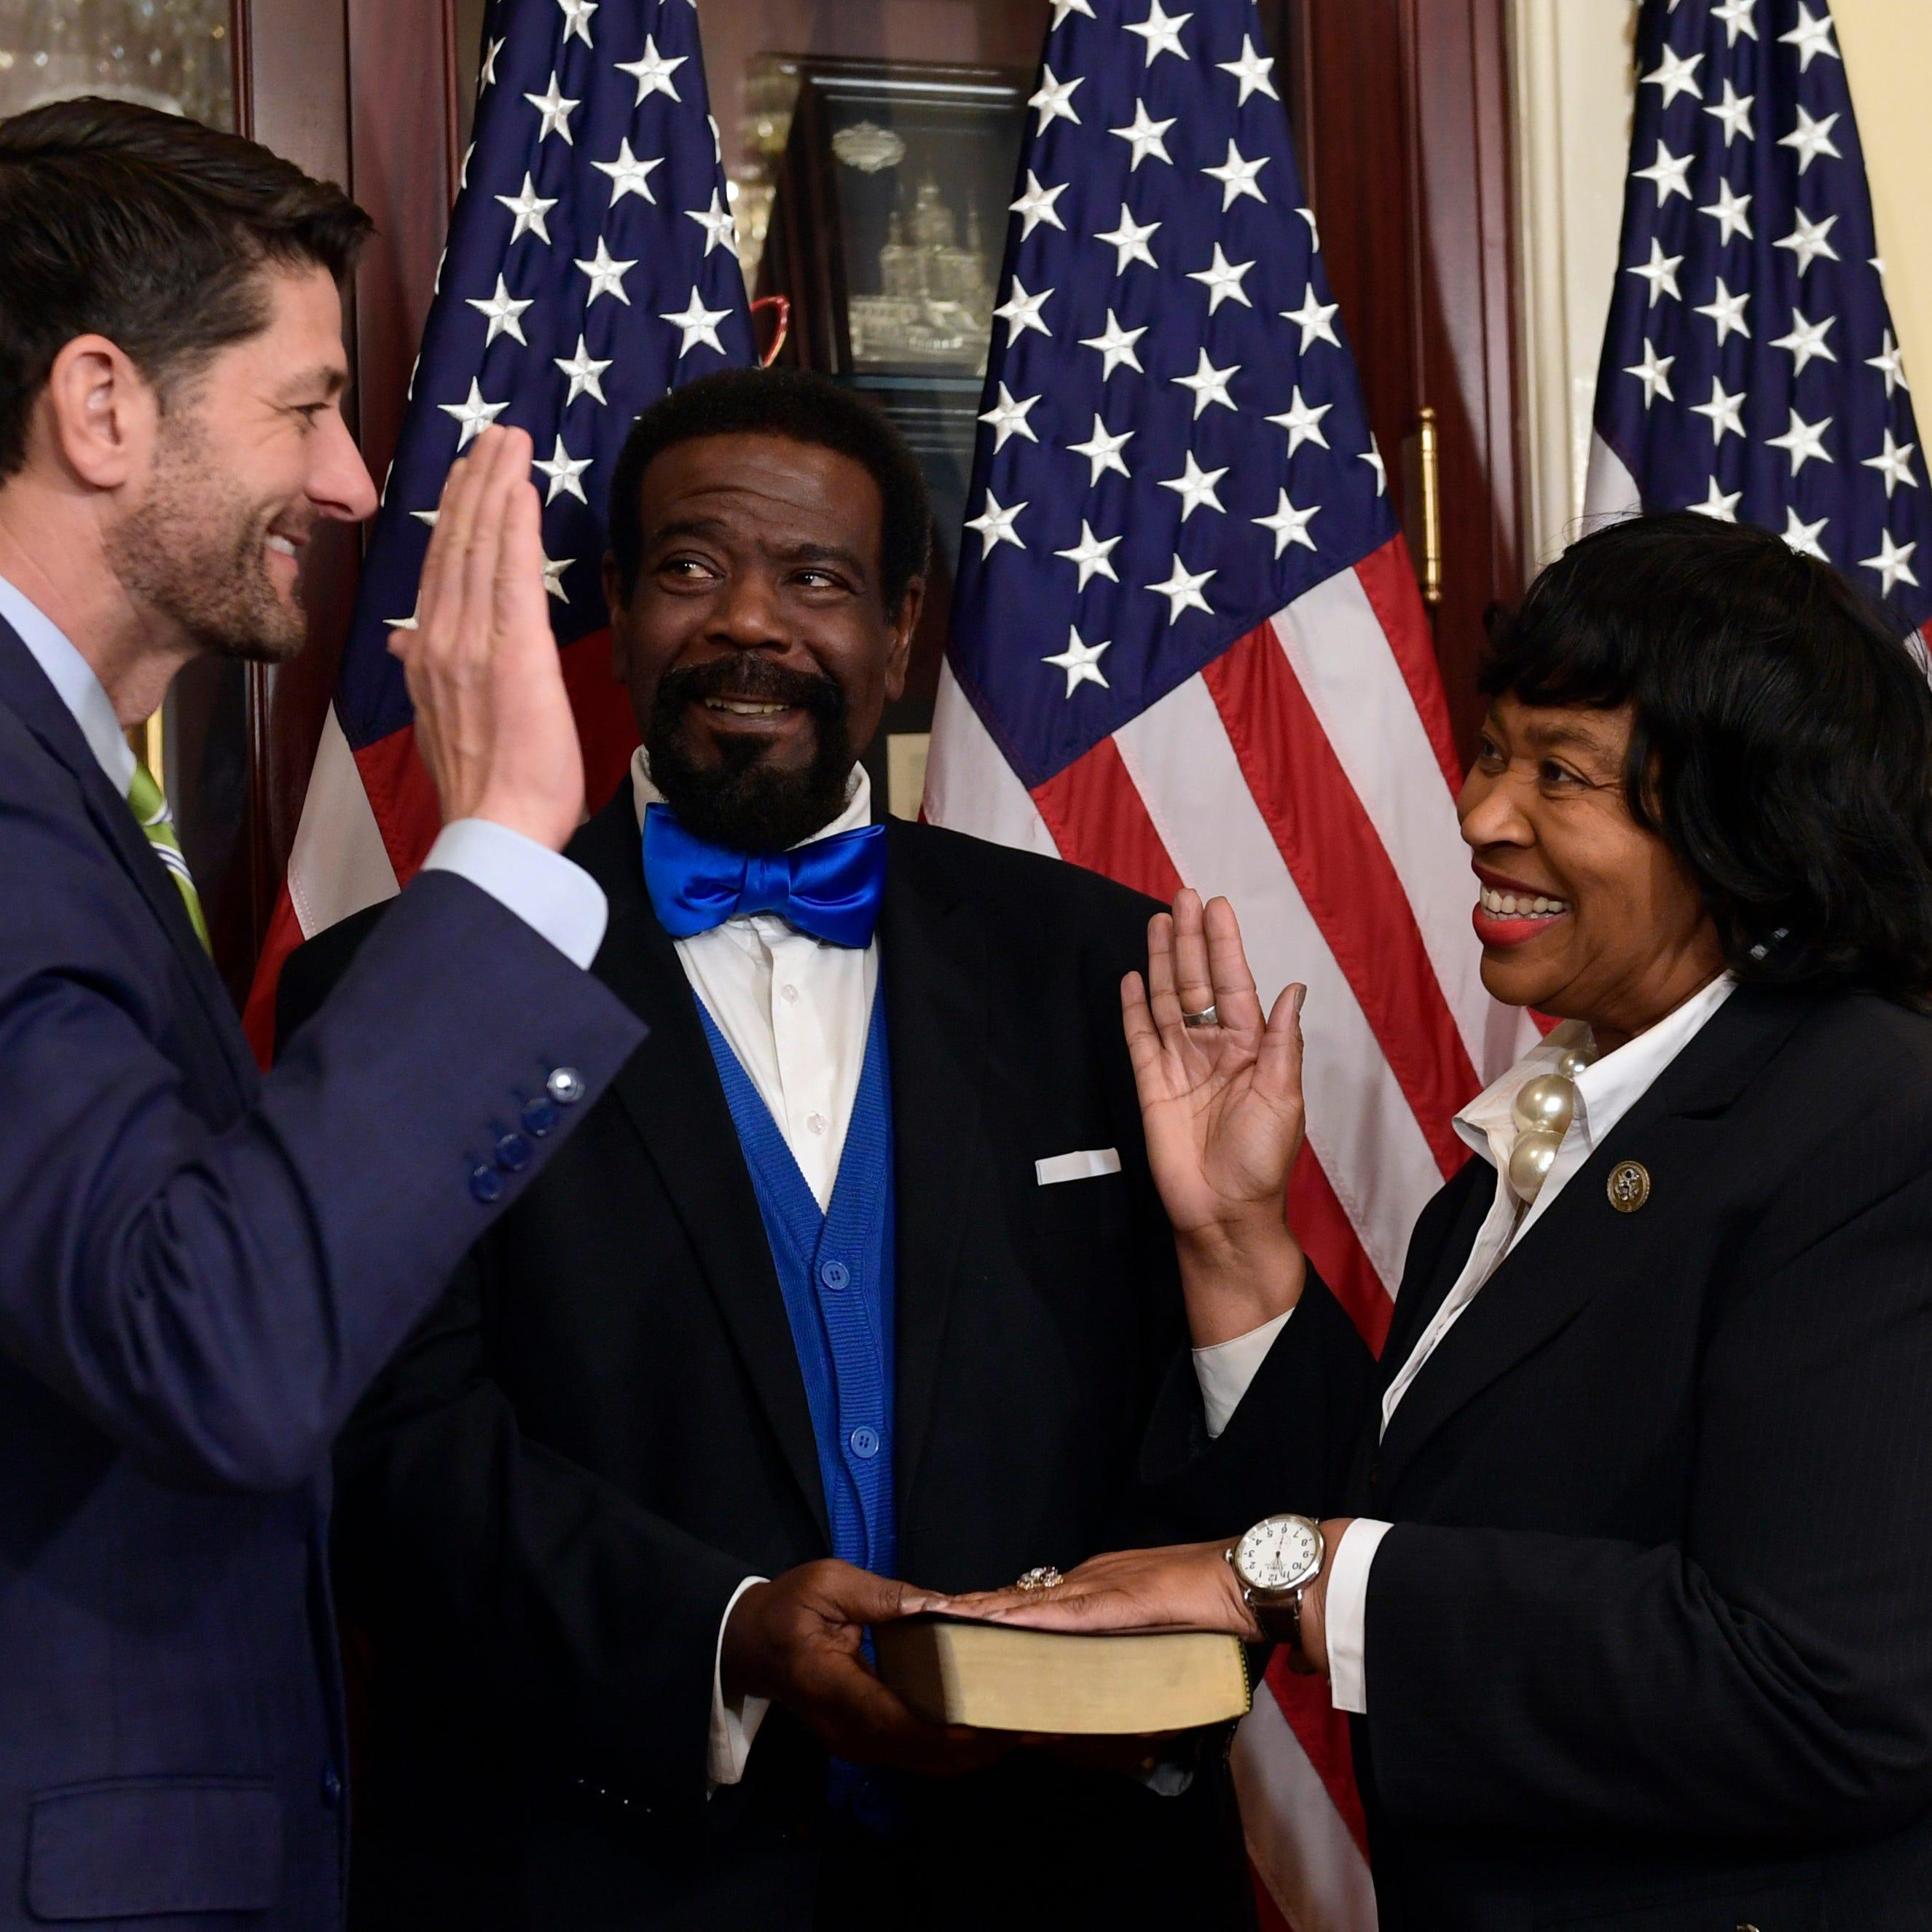 Jones sworn into Congress after deal reached